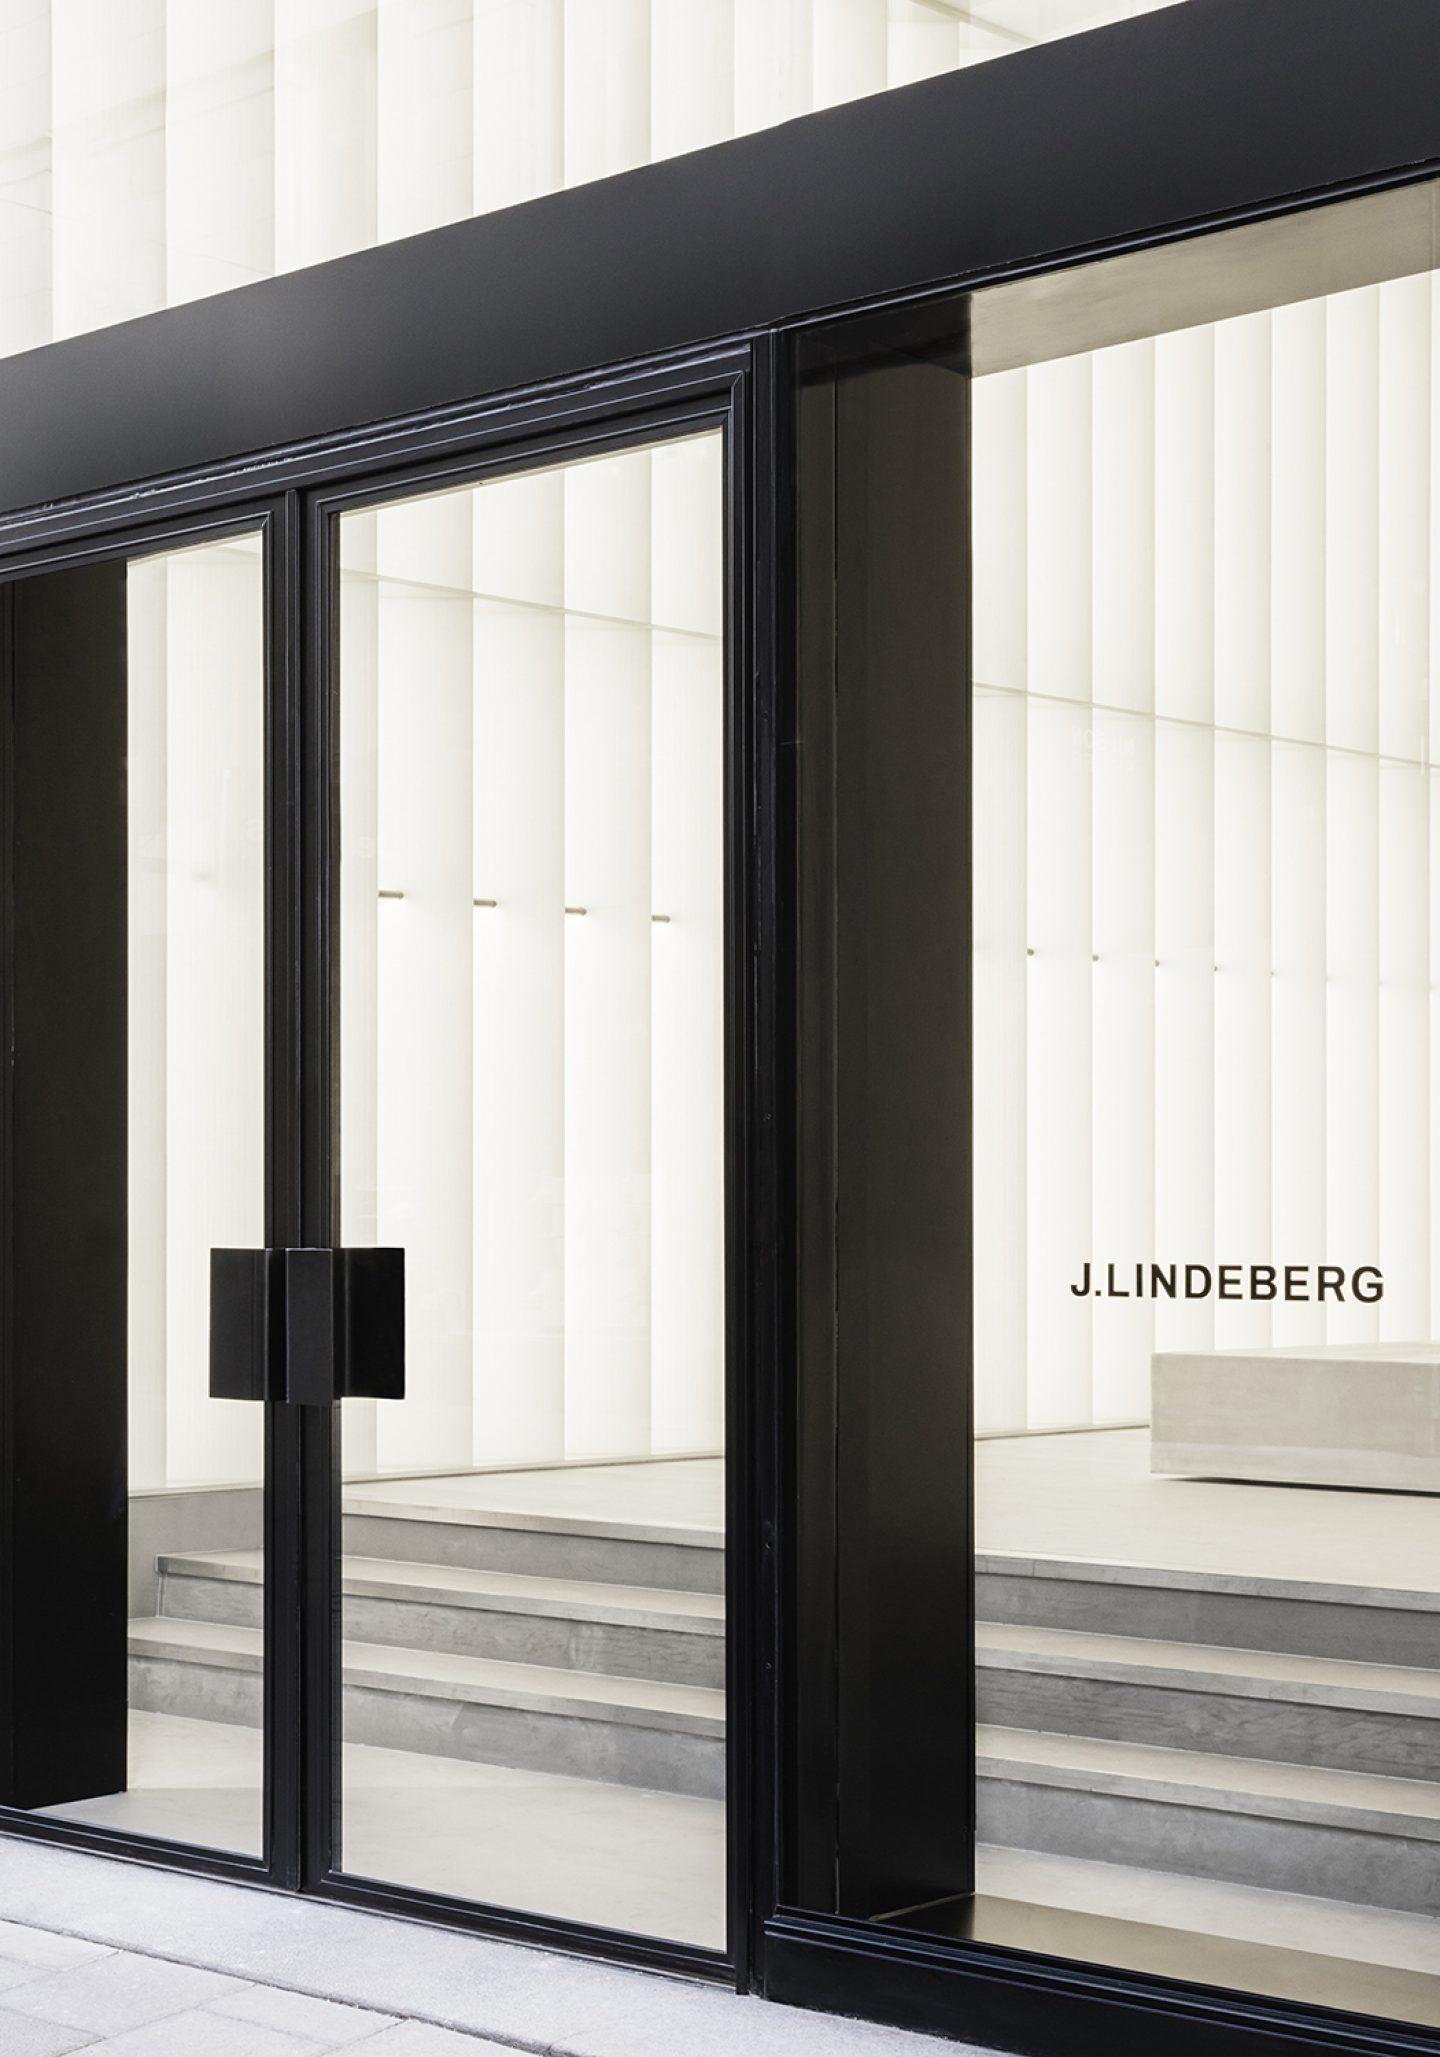 IGNANT-Design-Studio-David-Thulstrup-J-Lindeberg-Flagship-02